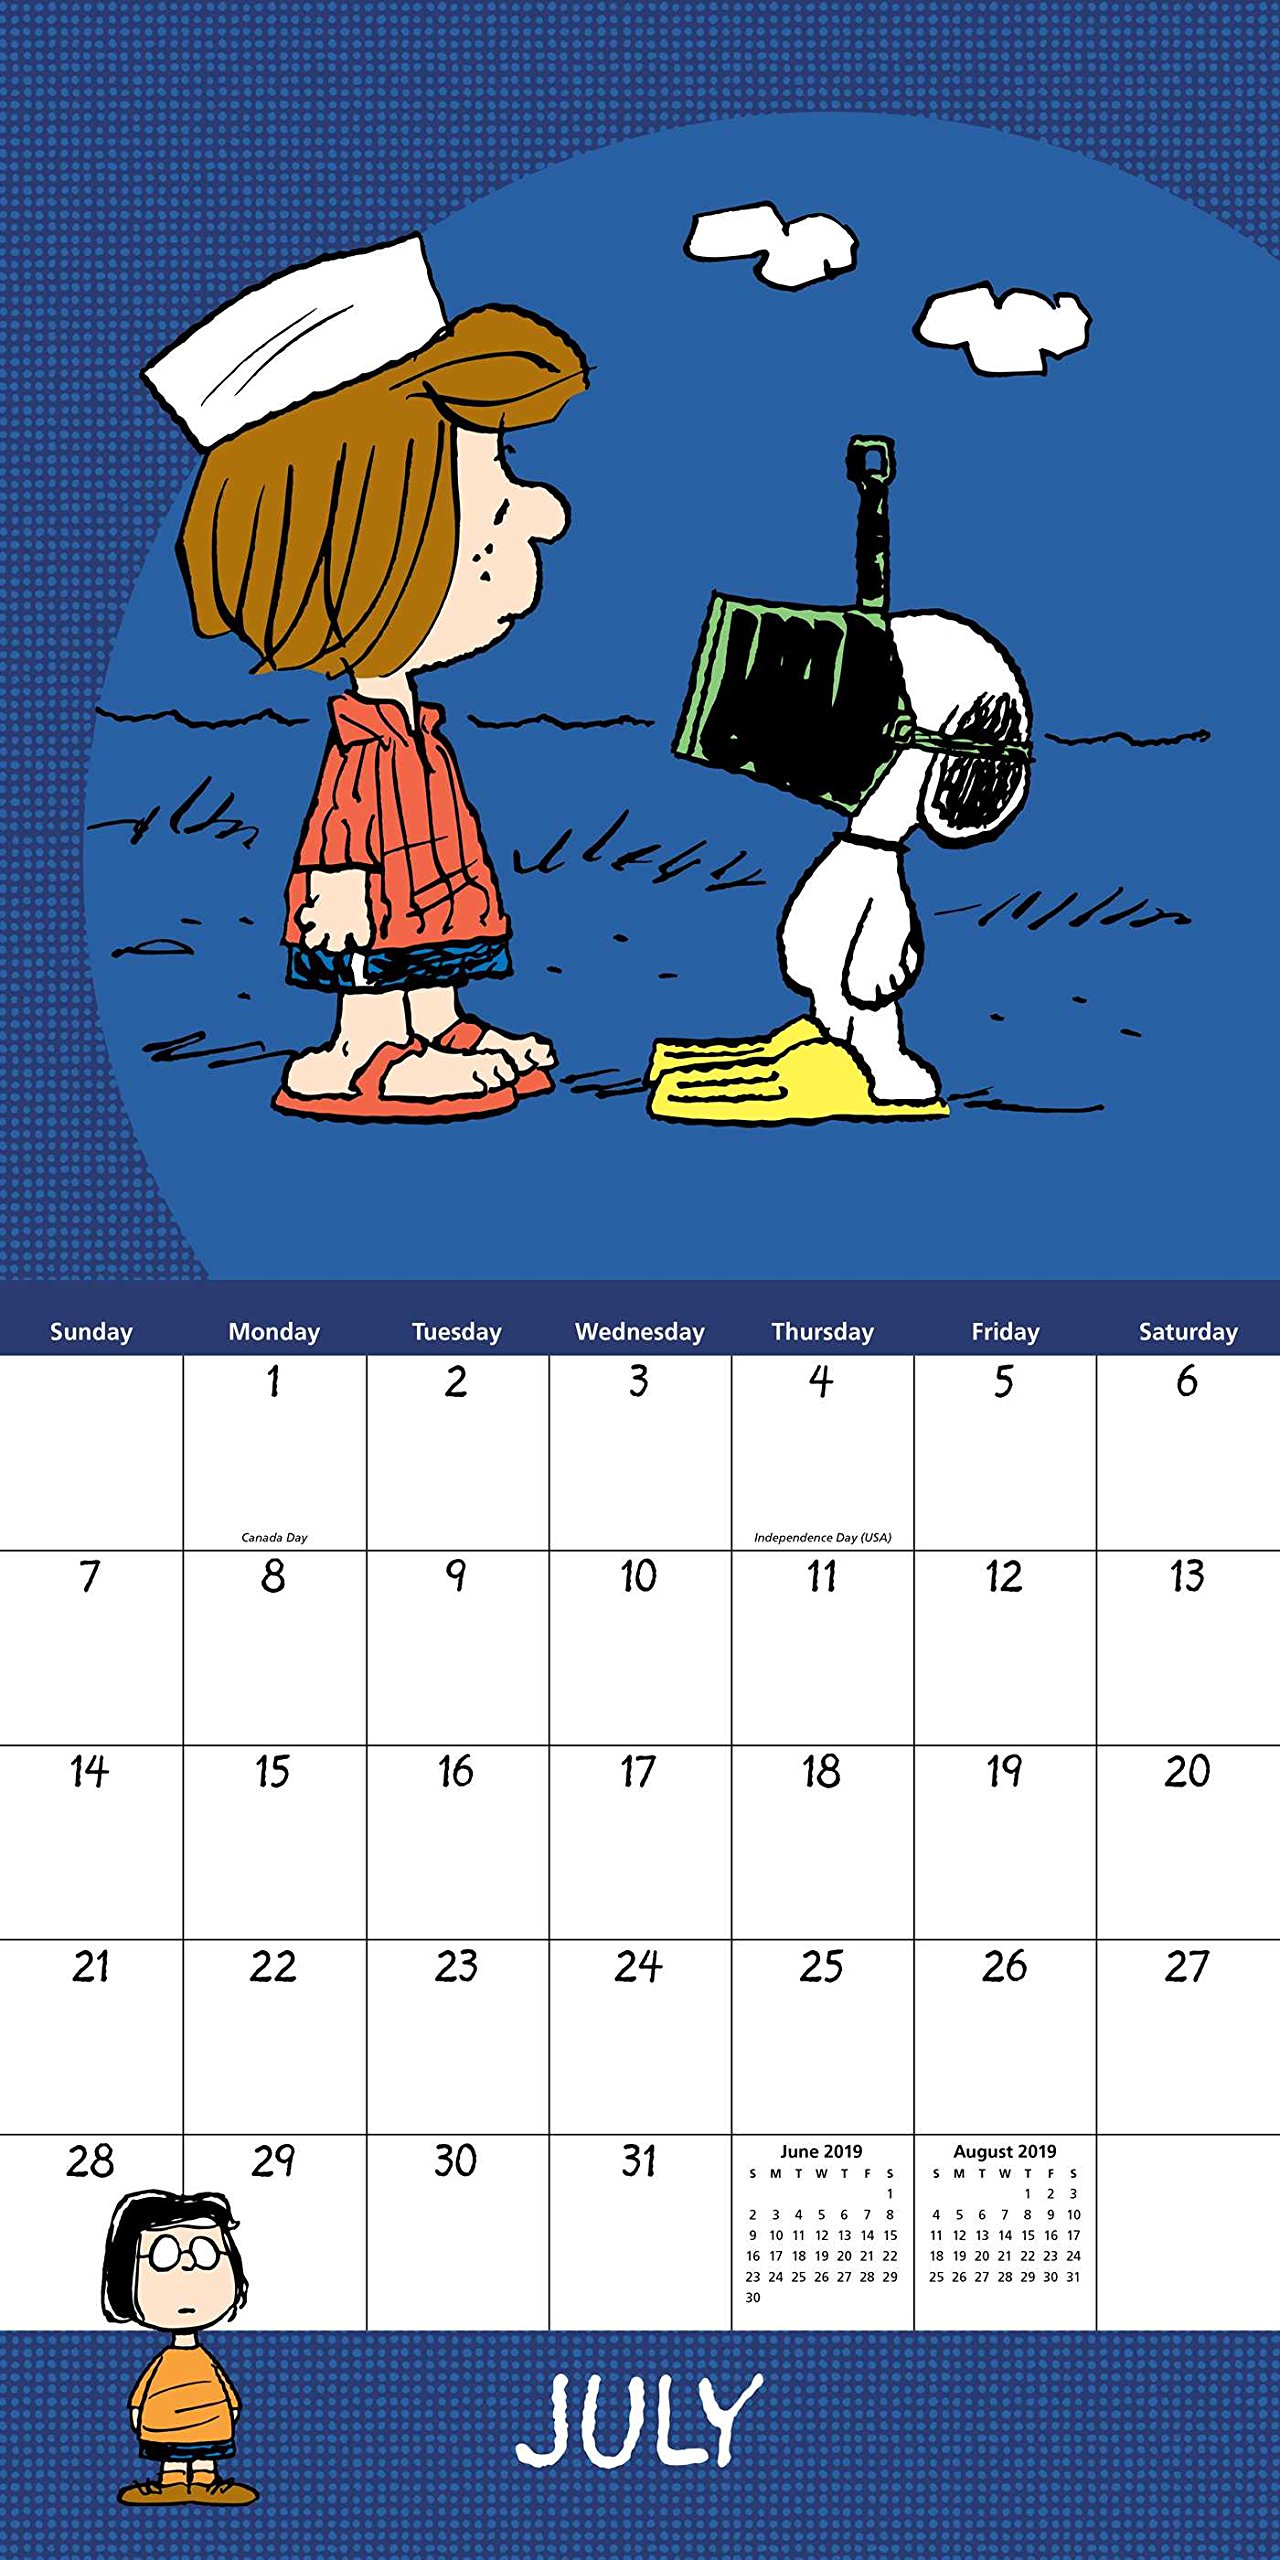 Calendario Snoopy 2020.Peanuts 2019 Wall Calendar Peanuts Worldwide Llc